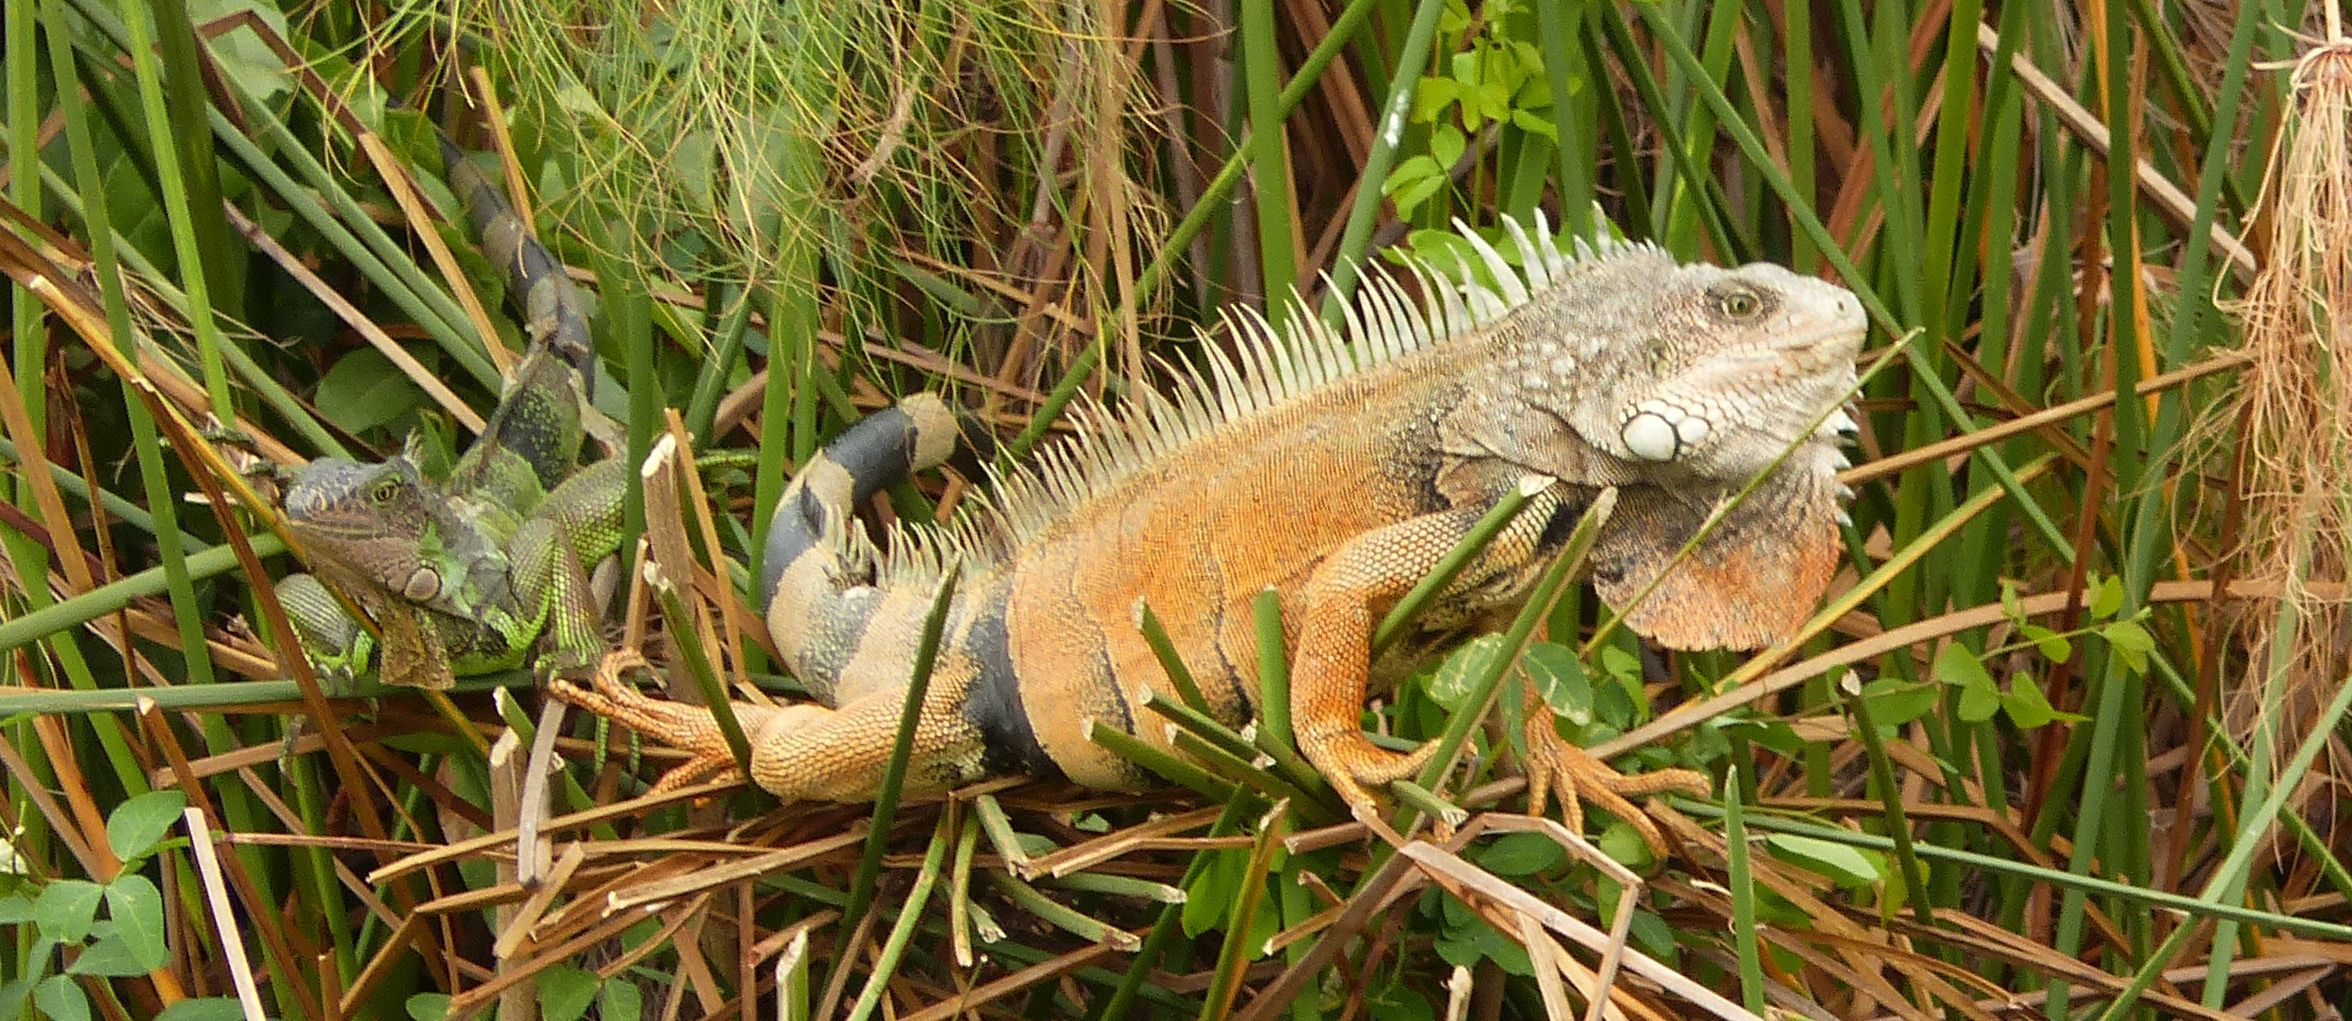 P3050392 solstice noon hour iguanas